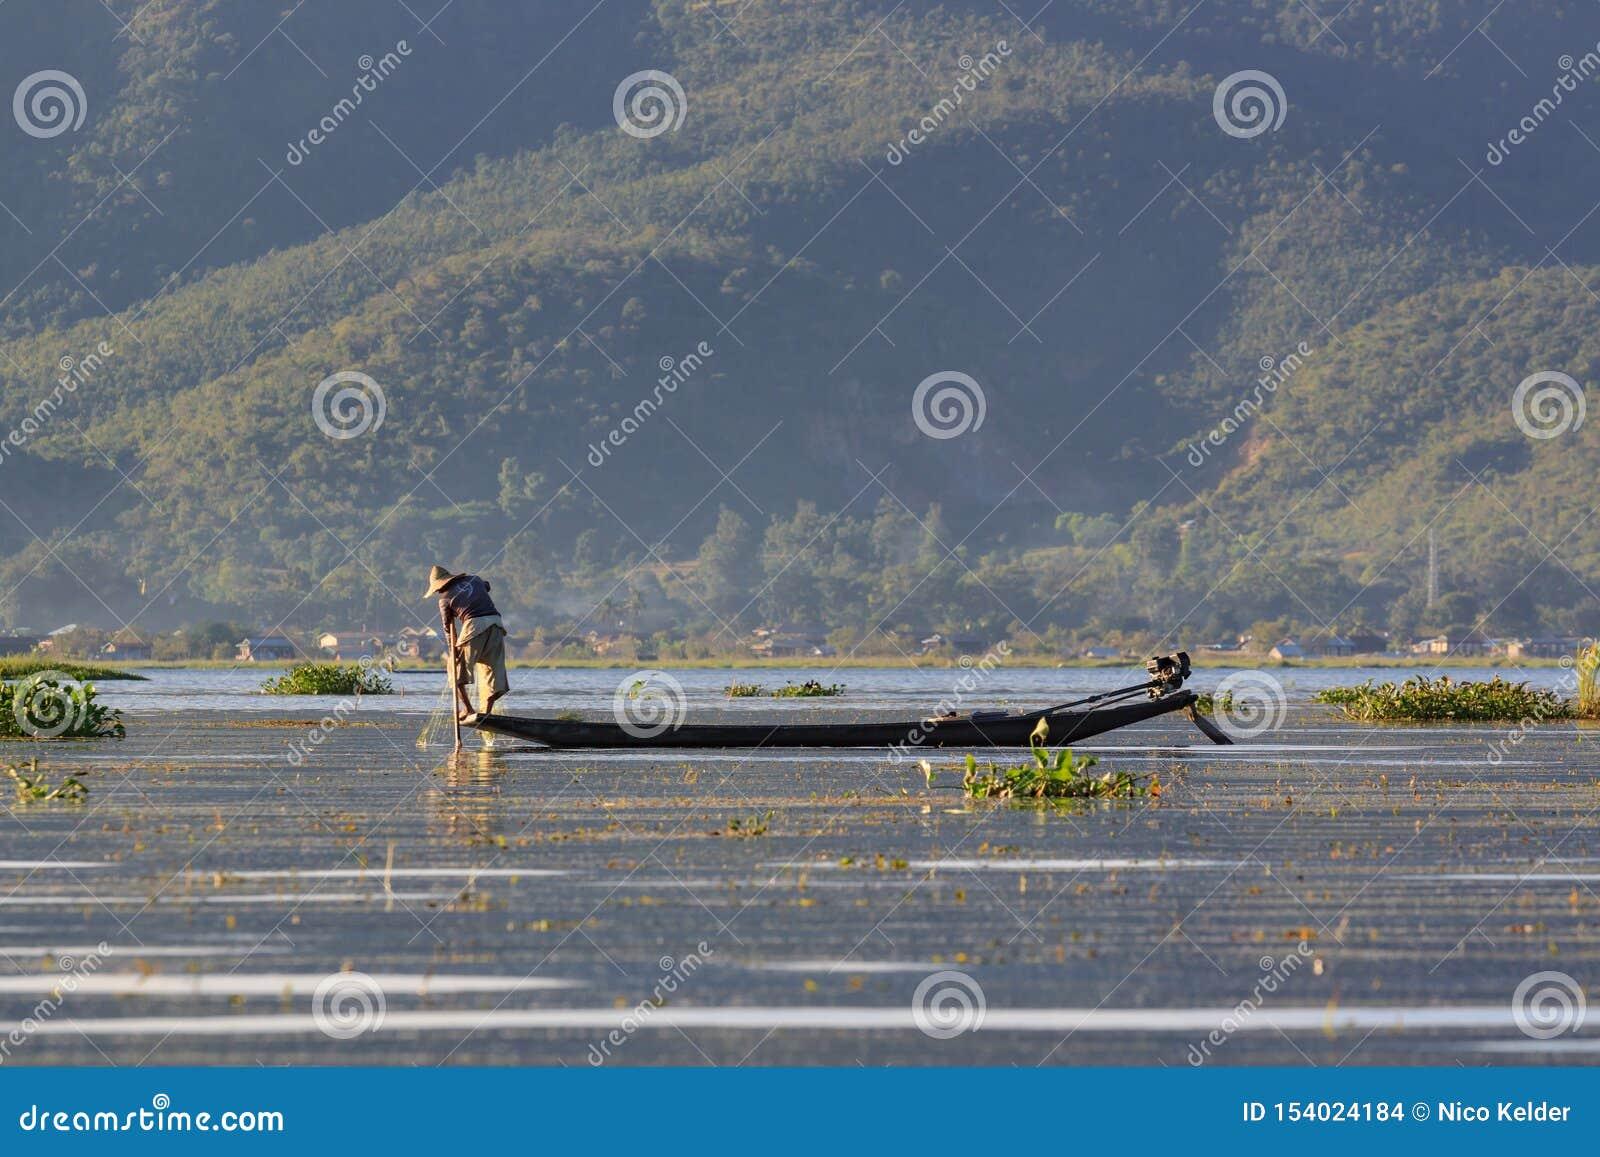 Lago Inle, Myanmar, o 20 de novembro de 2018 - pescadores autênticos que trabalham verificando suas redes nas águas do lago Inle